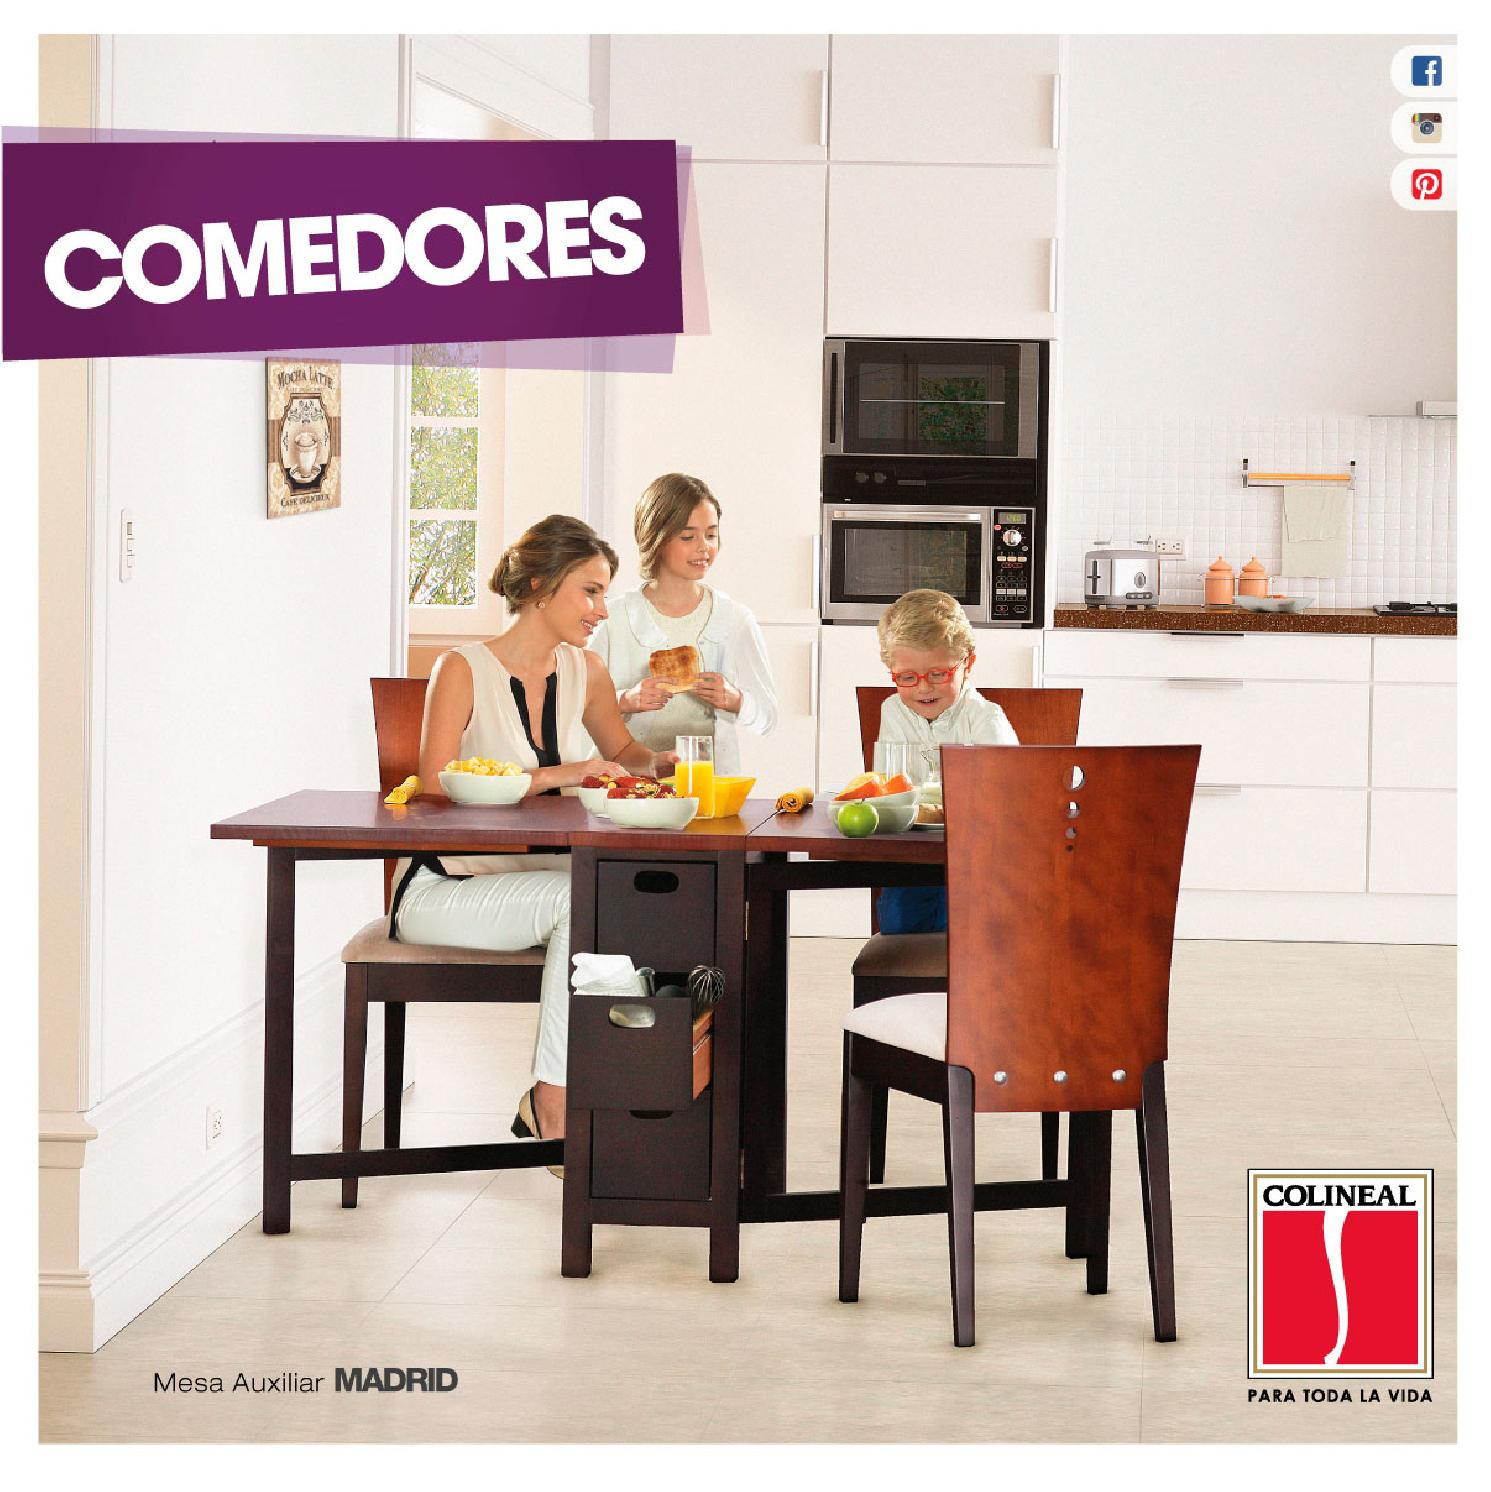 Catálogo Comedores - Perú by Colineal - issuu